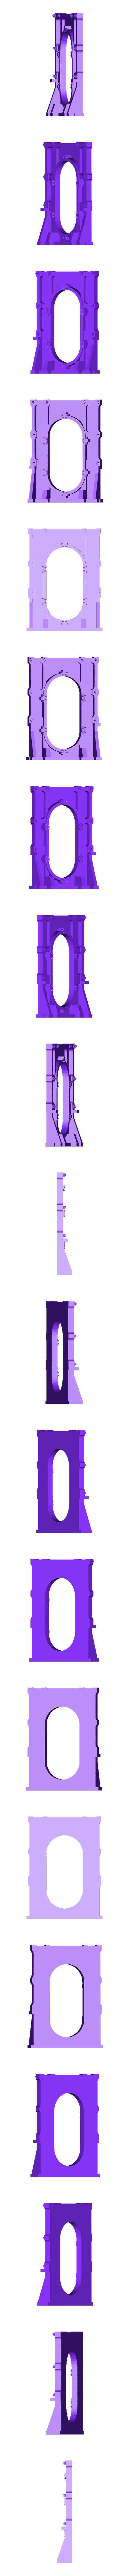 door3.stl Download free STL file 28mm Wargame Sci-fi door • 3D printable model, noodledenis